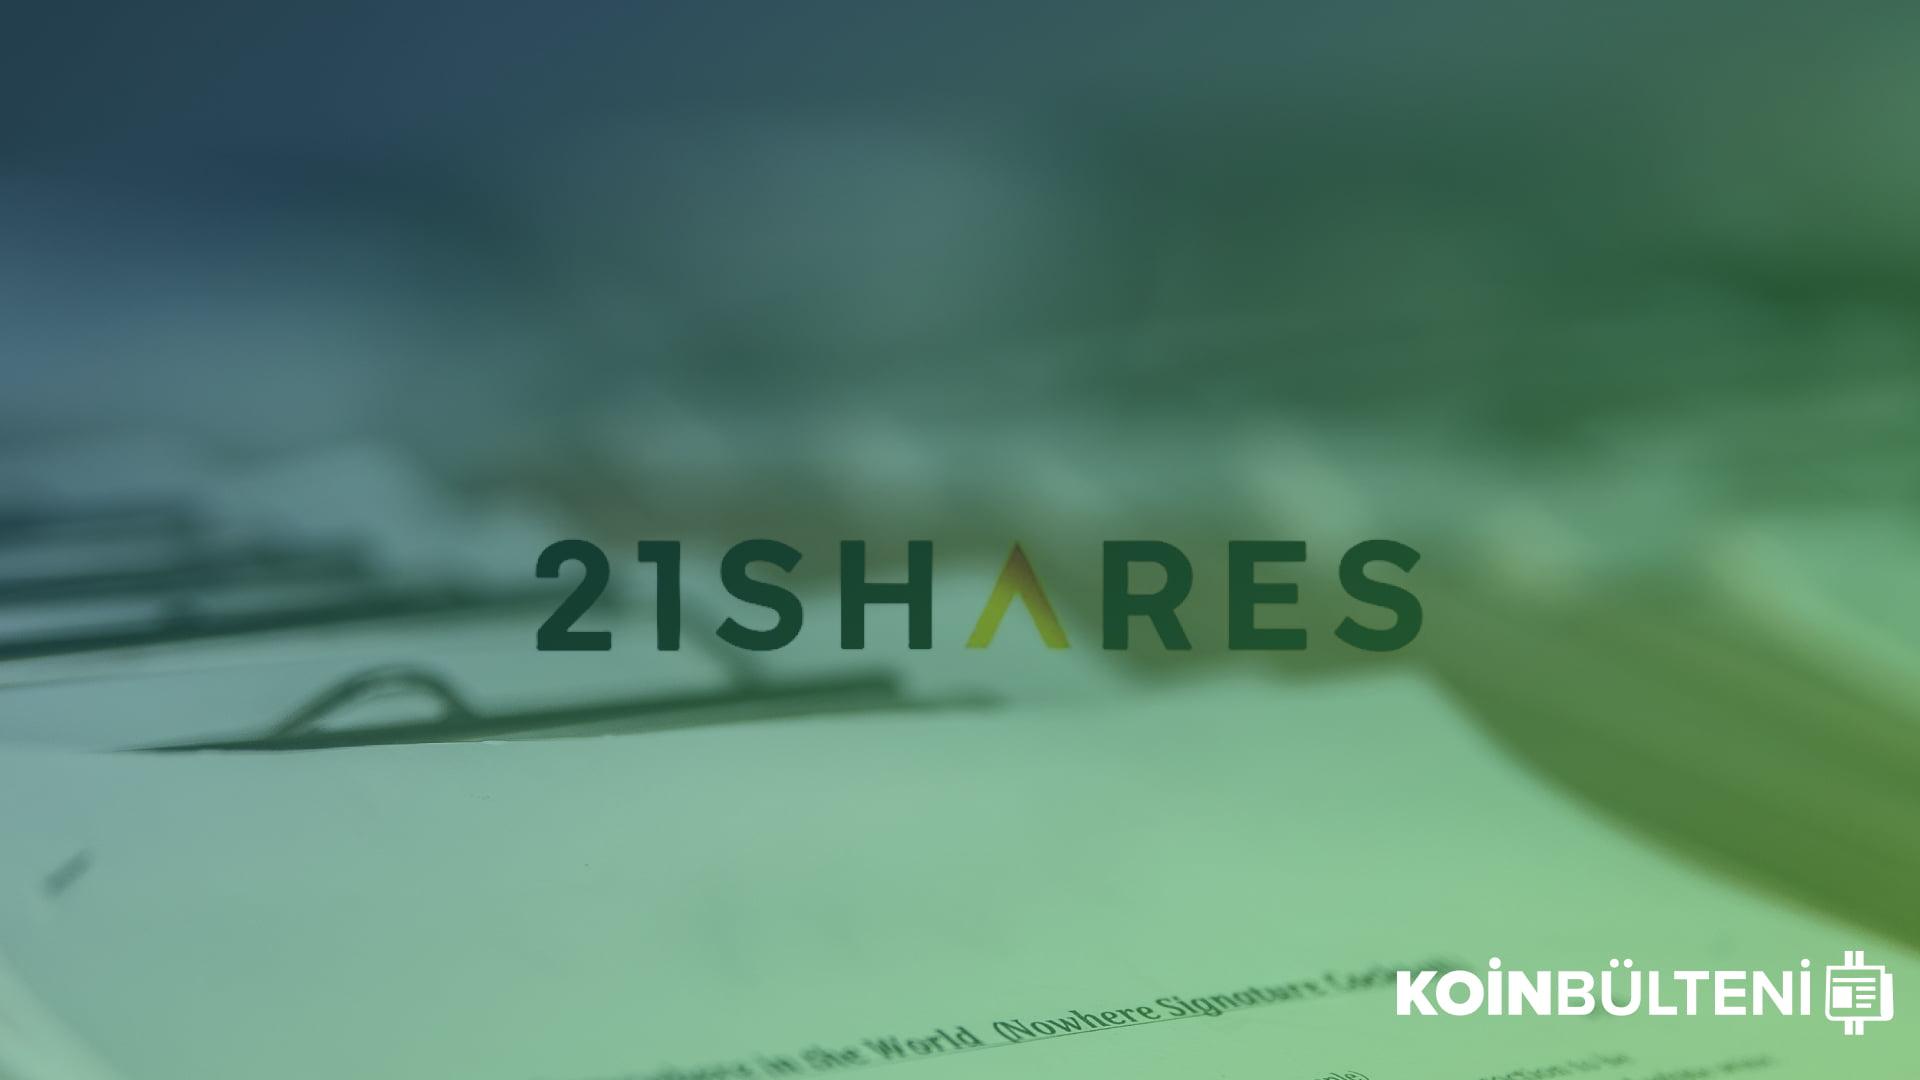 21shares-xrp-ripple-kripto-para-sec-dava-borsa